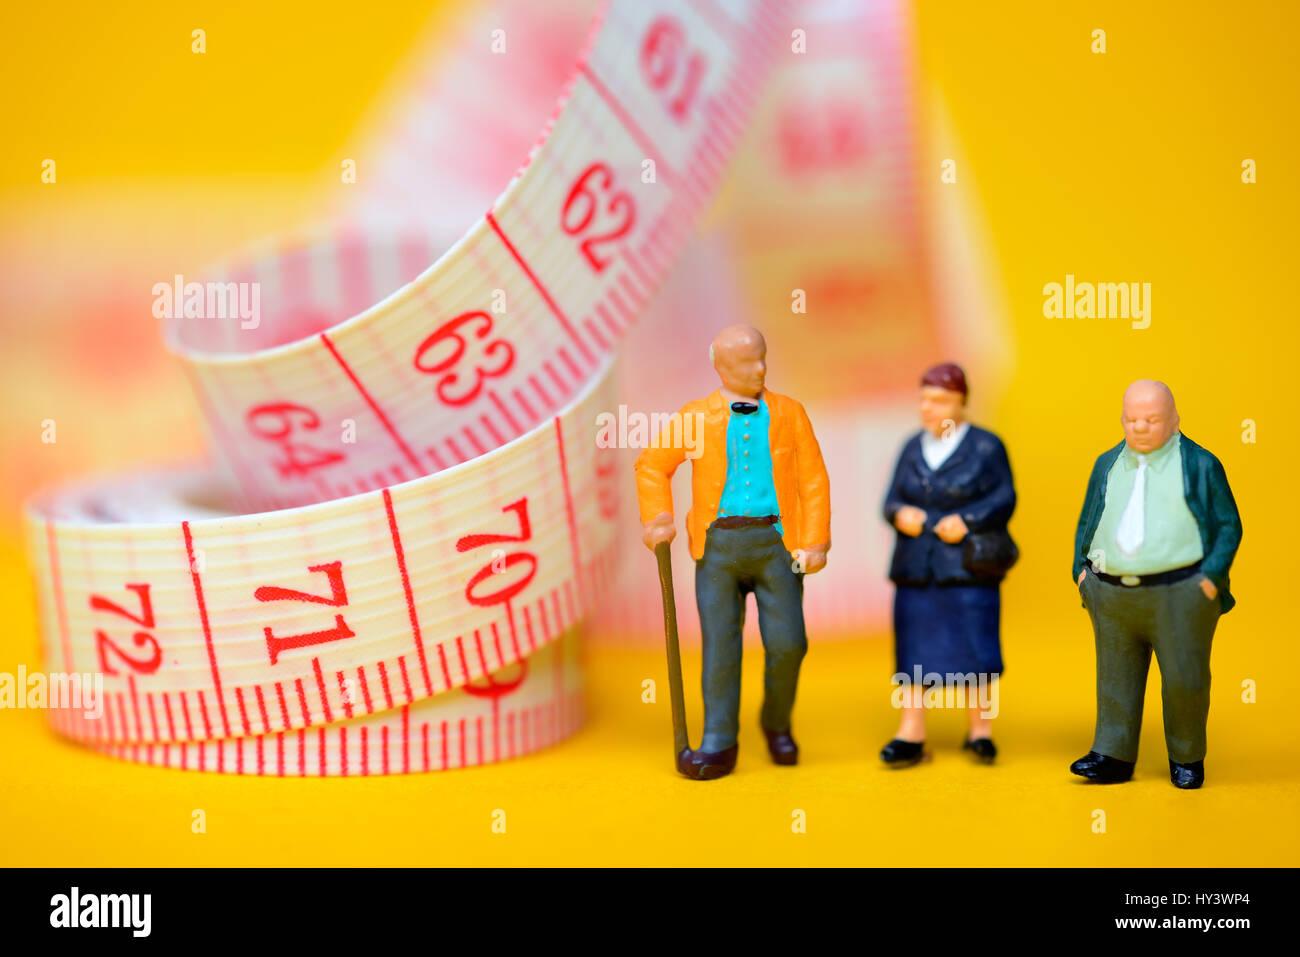 Senior citizens and dimension tape, symbolic photo Flexi pension, Senioren und Maßband, Symbolfoto Flexi-Rente Stock Photo